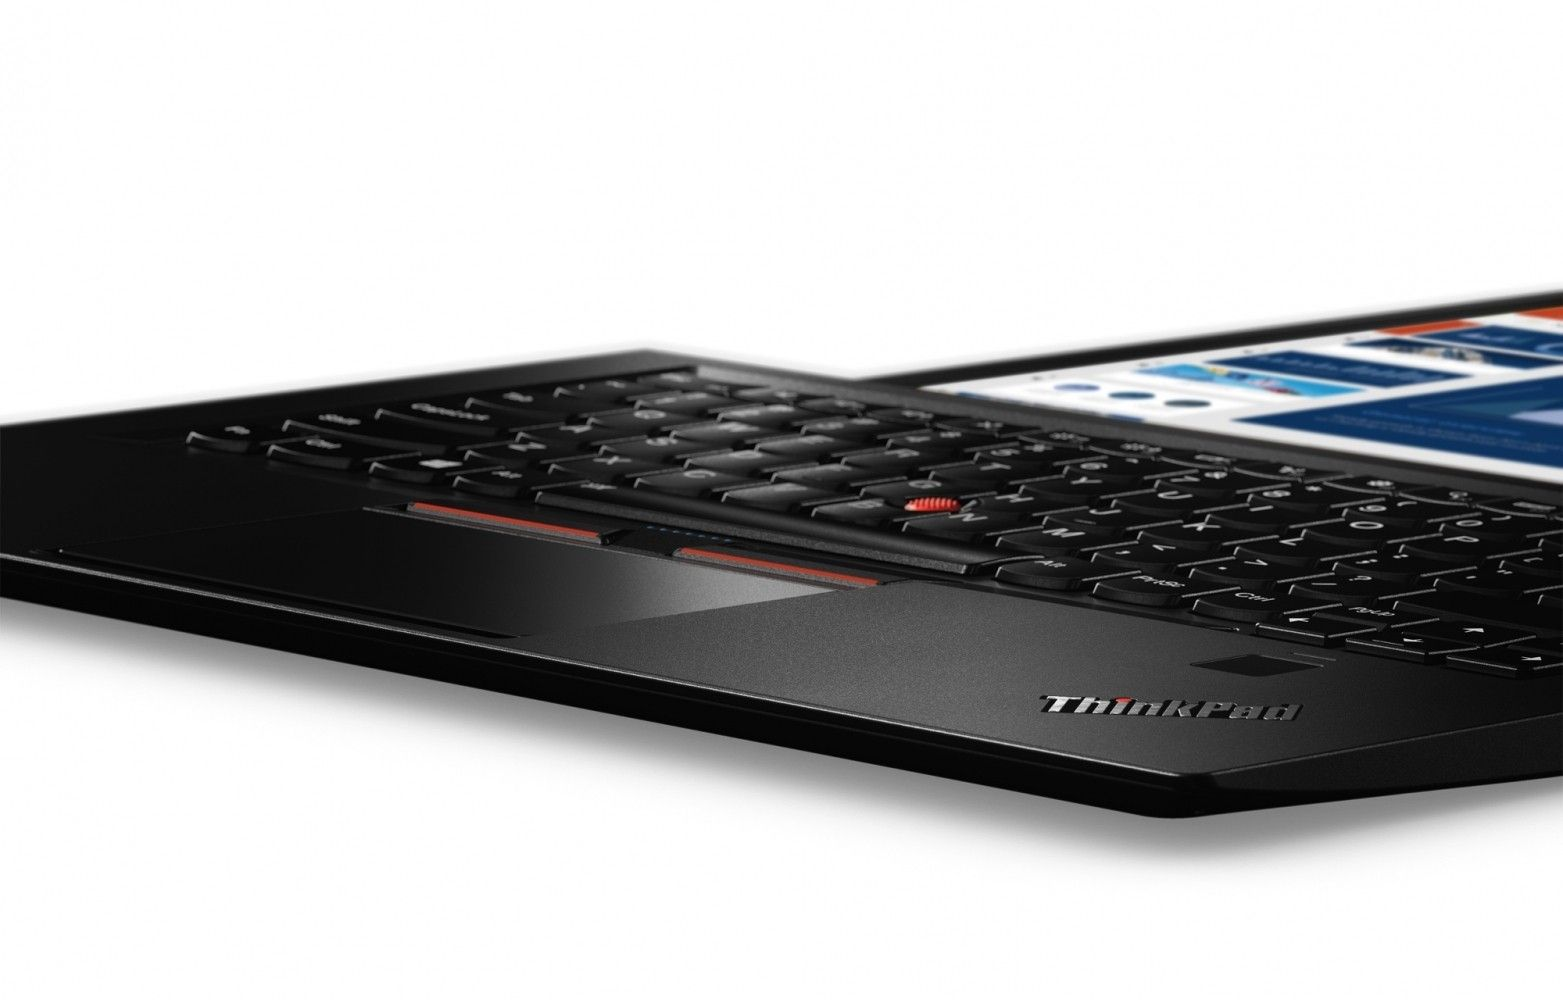 Ноутбук LENOVO ThinkPad X1 Carbon G4 (20FBS02H00) - 3